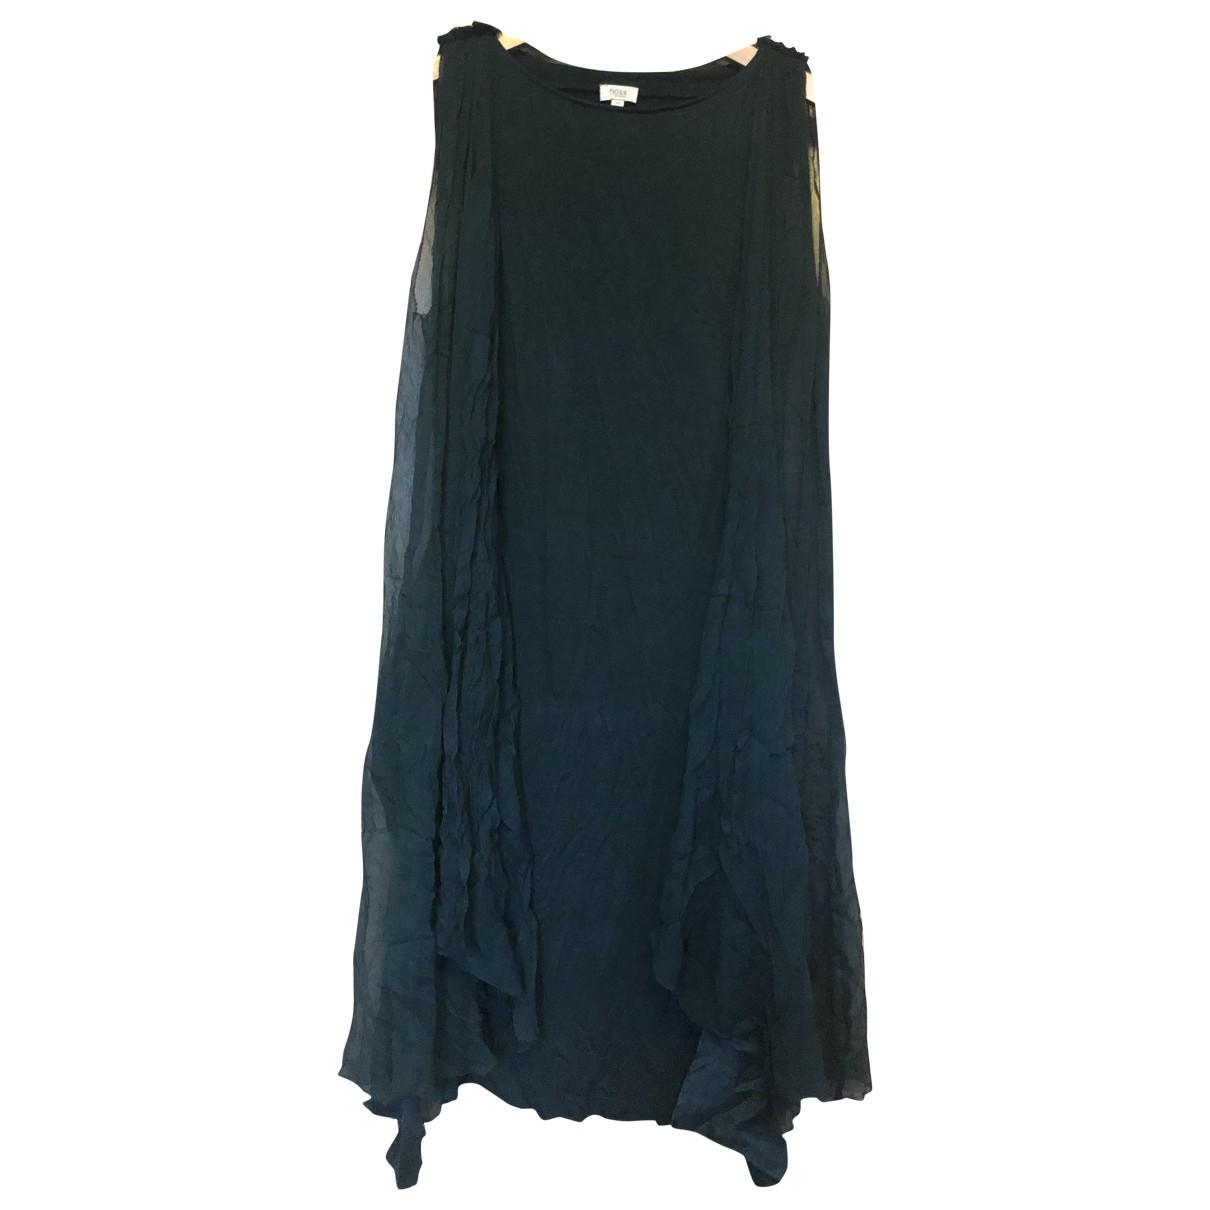 Hoss Intropia \N Kleid in  Gruen Baumwolle